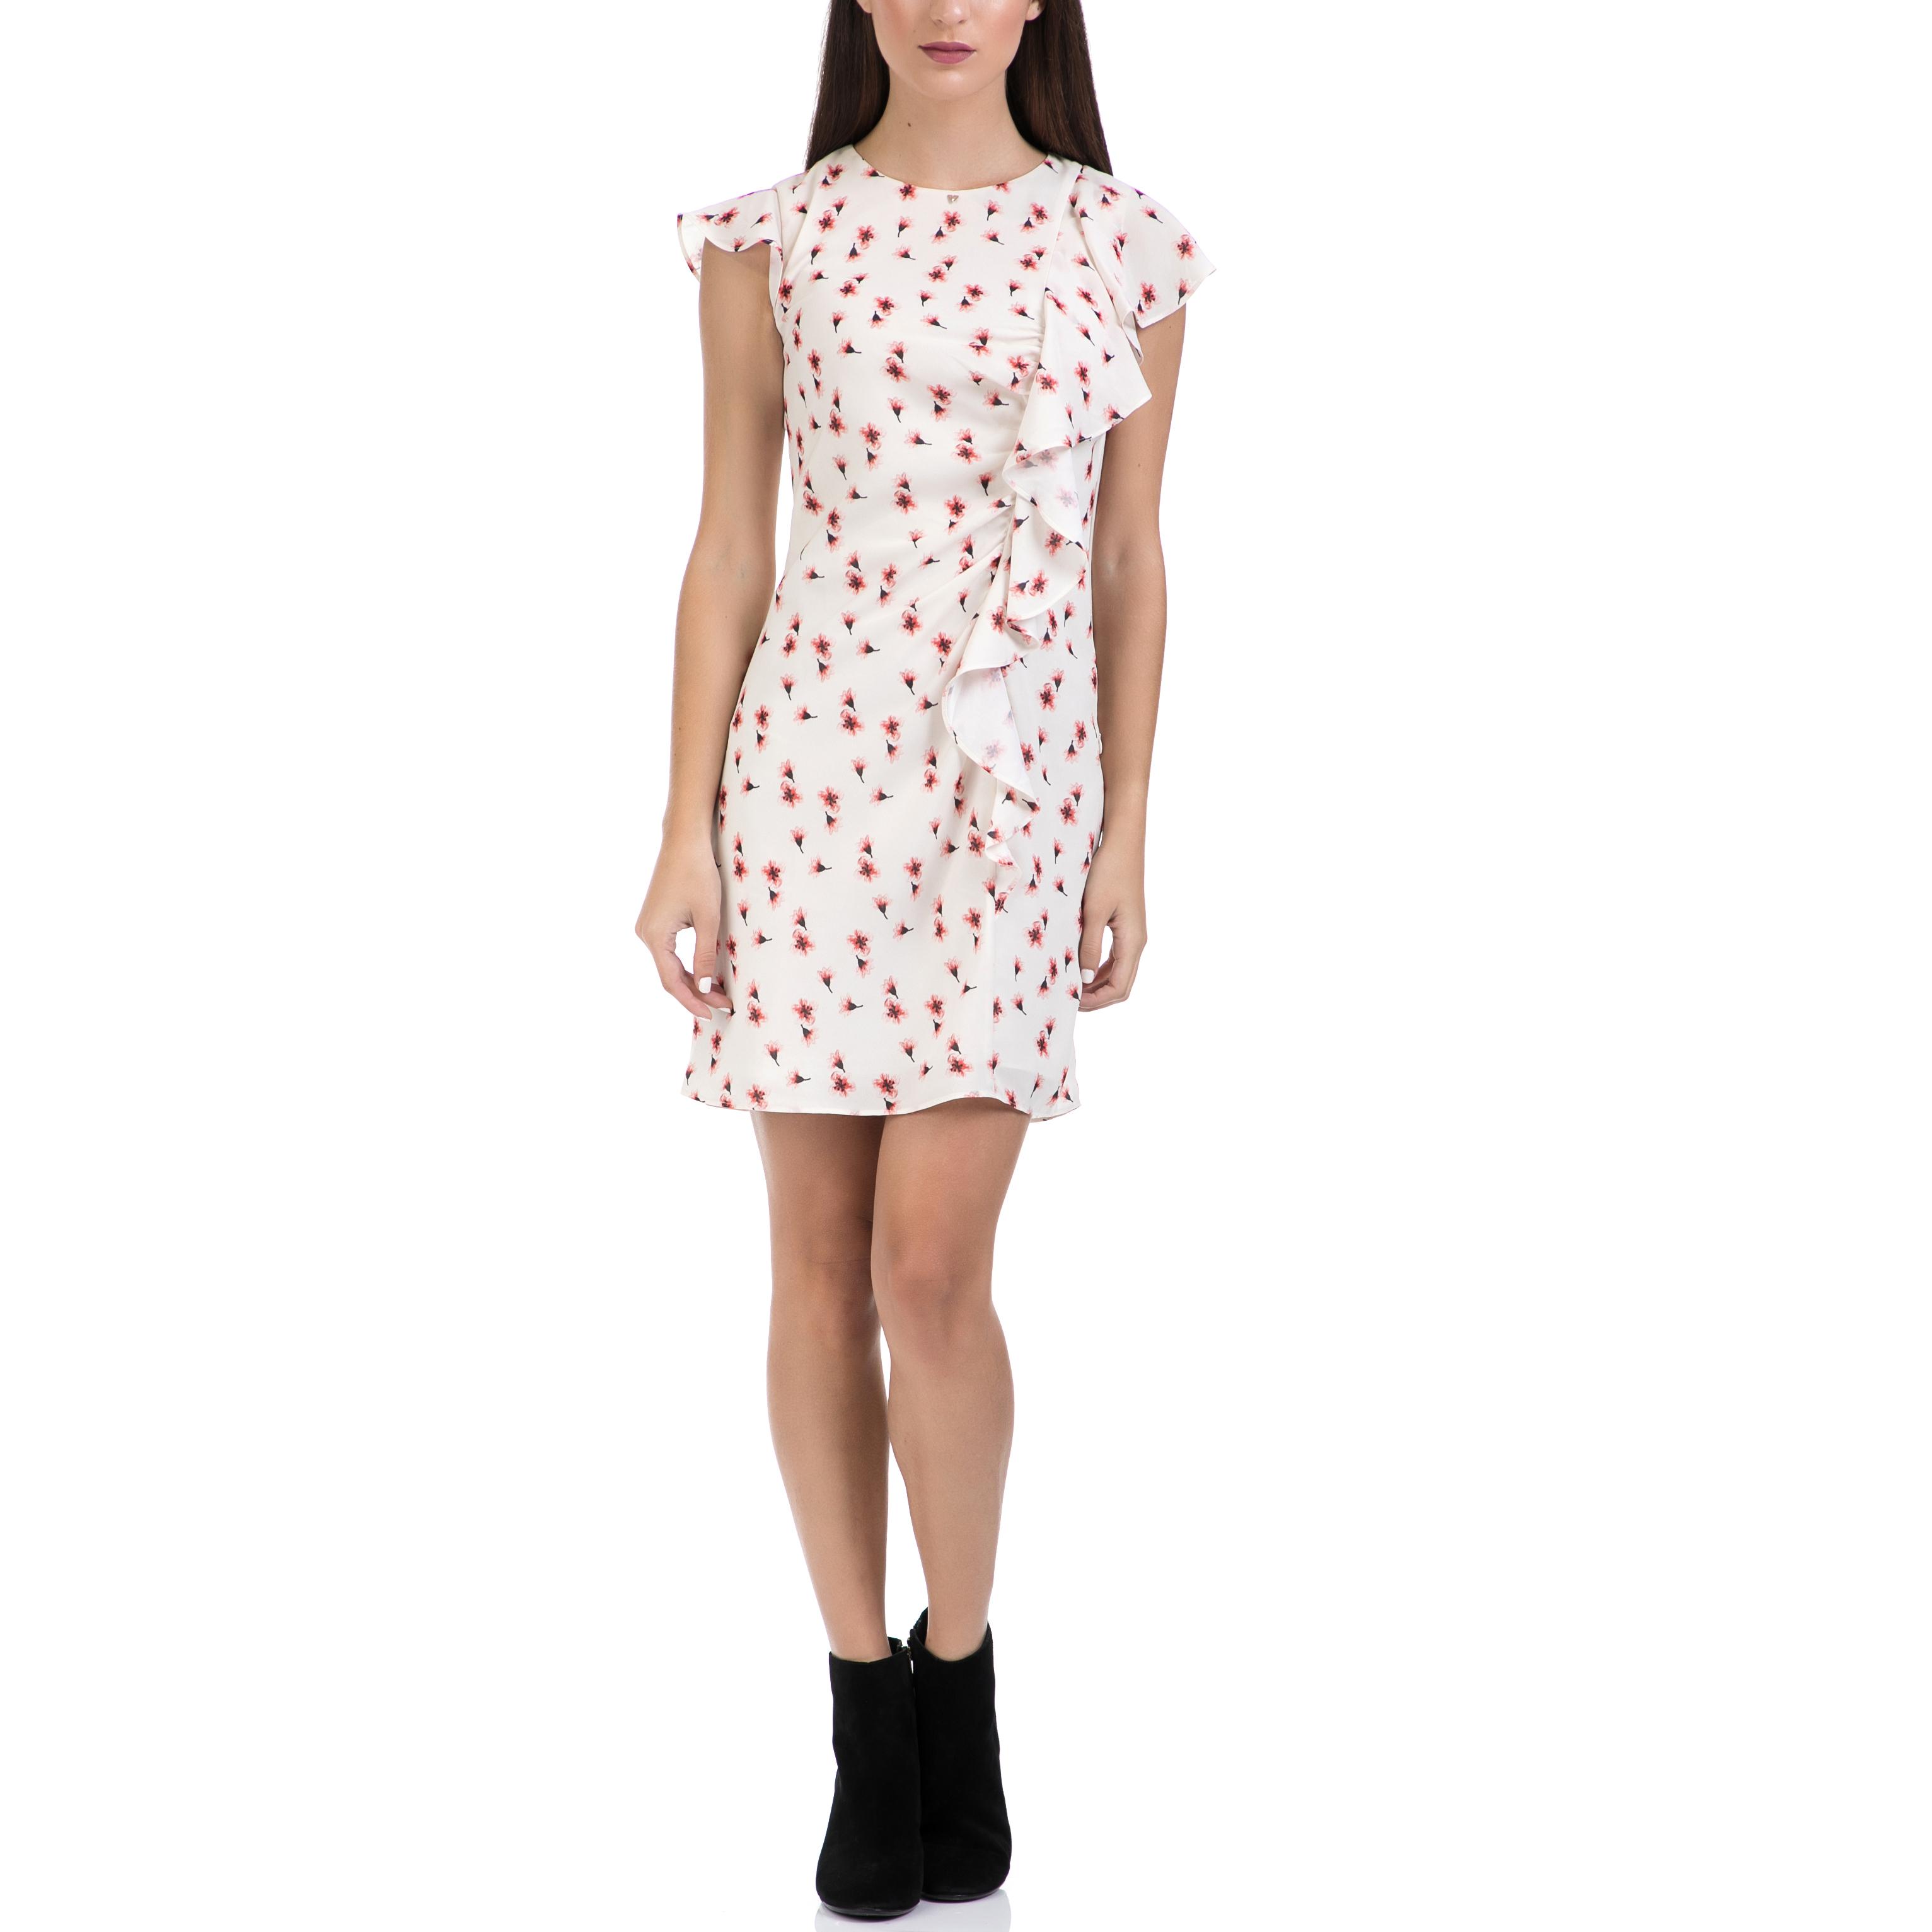 GUESS - Γυναικείο φόρεμα GUESS εμπριμέ γυναικεία ρούχα φορέματα μίνι